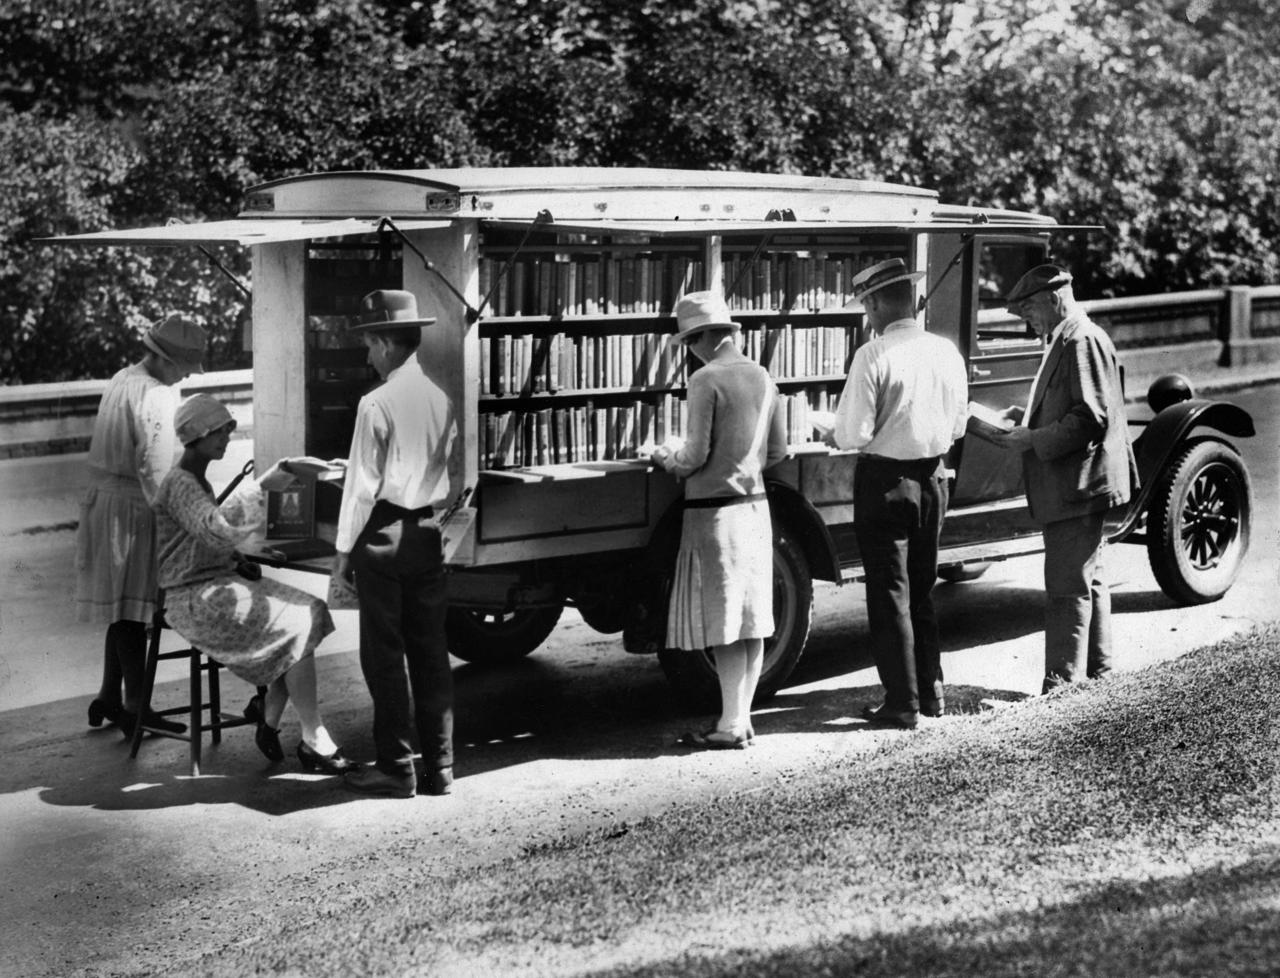 Cincinnati Public Library bookmobile, 1927